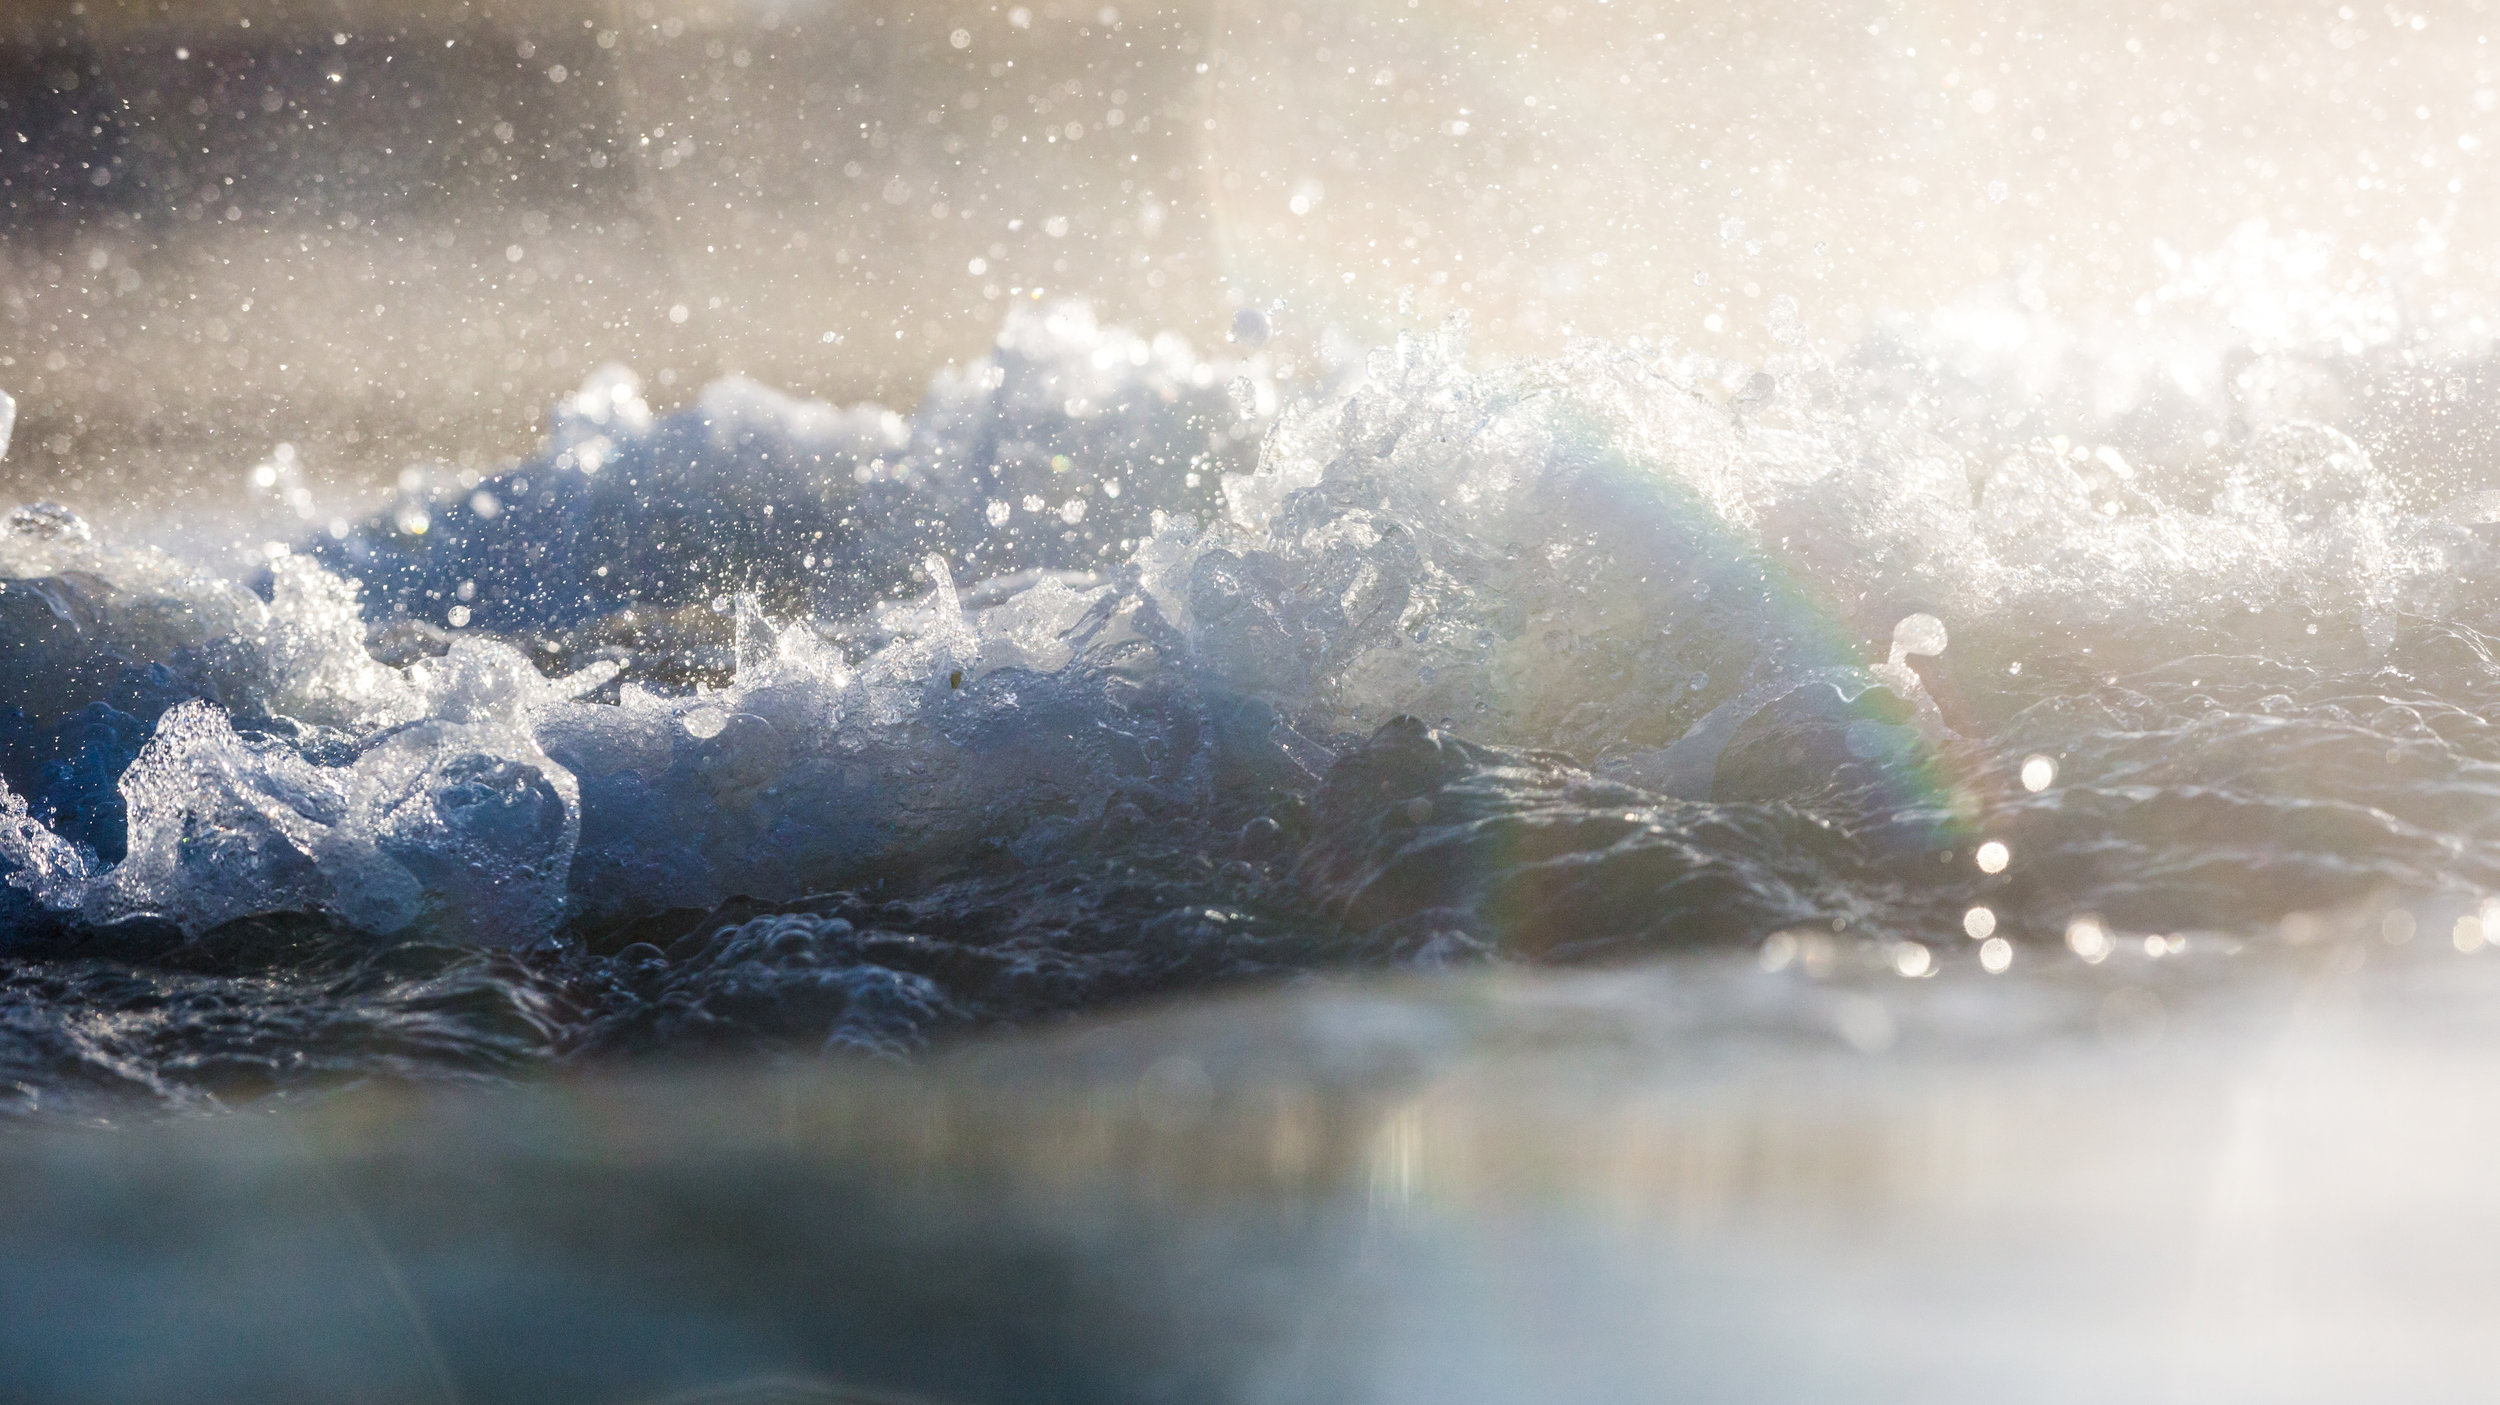 Jake Plumridge_Splashing around_Photography.jpg